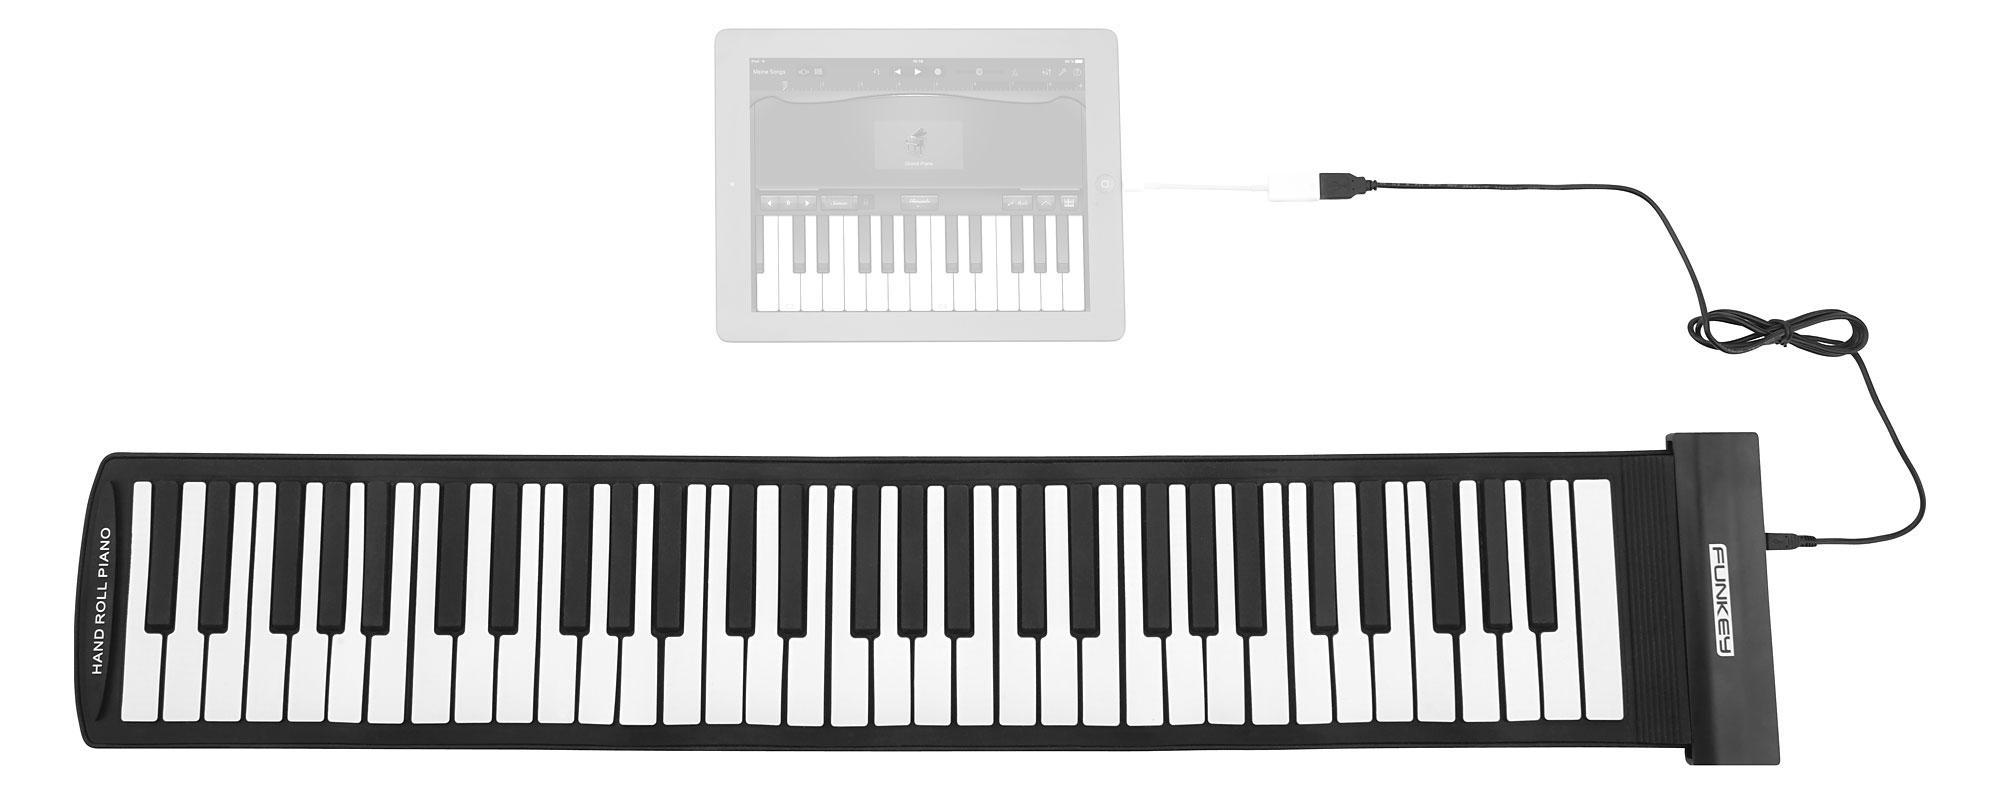 61-Tasten Rollpiano Kinder Keyboard Rollup E-Piano MIDI Silikon für unterwegs